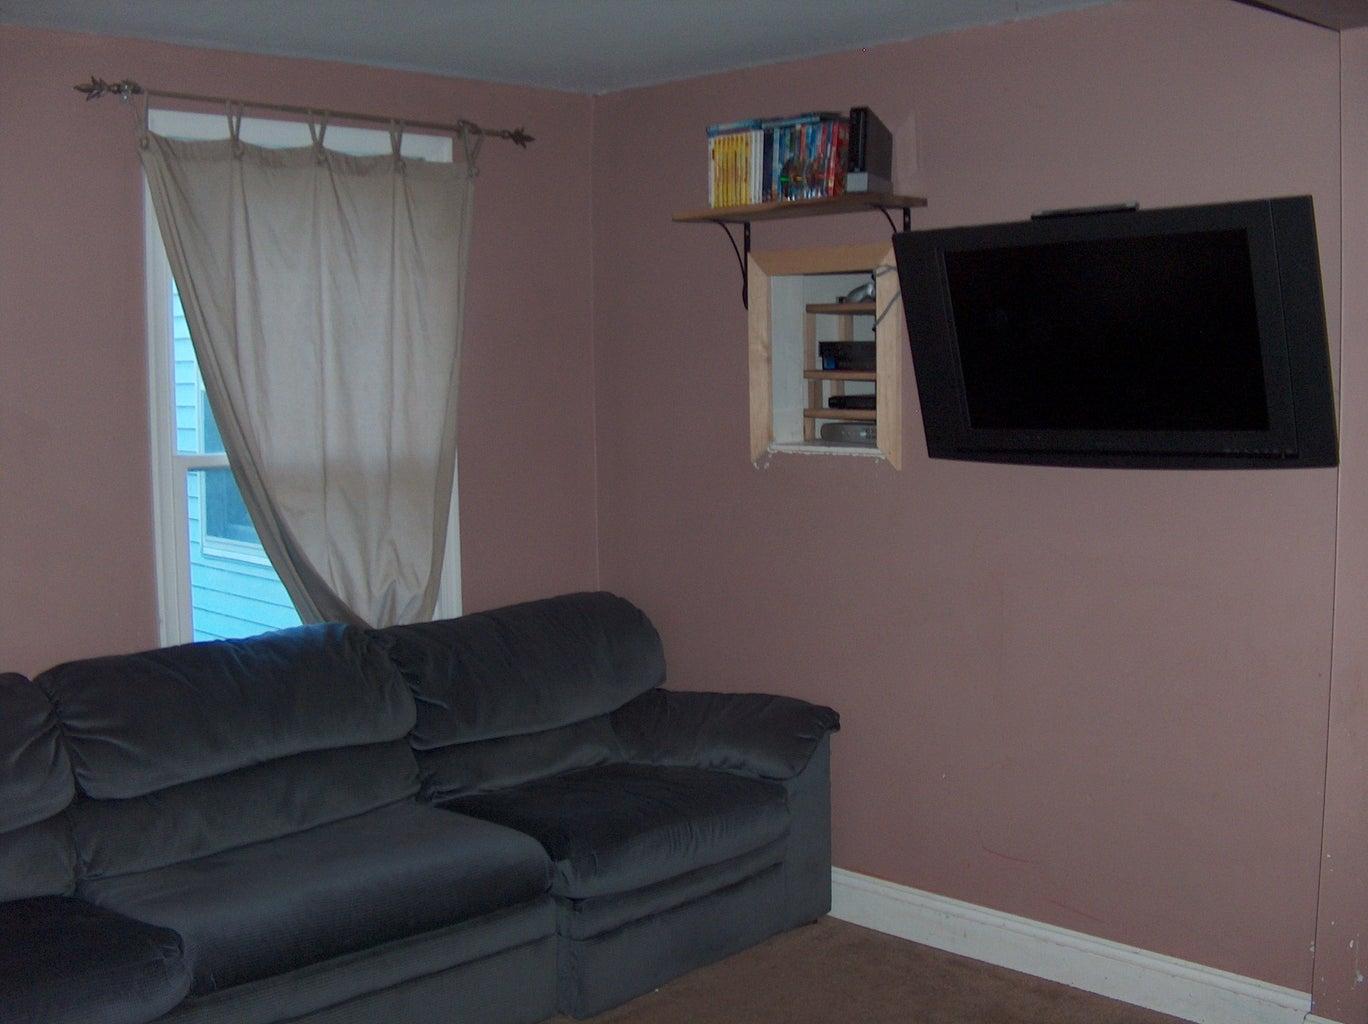 Reclaiming My Living Room